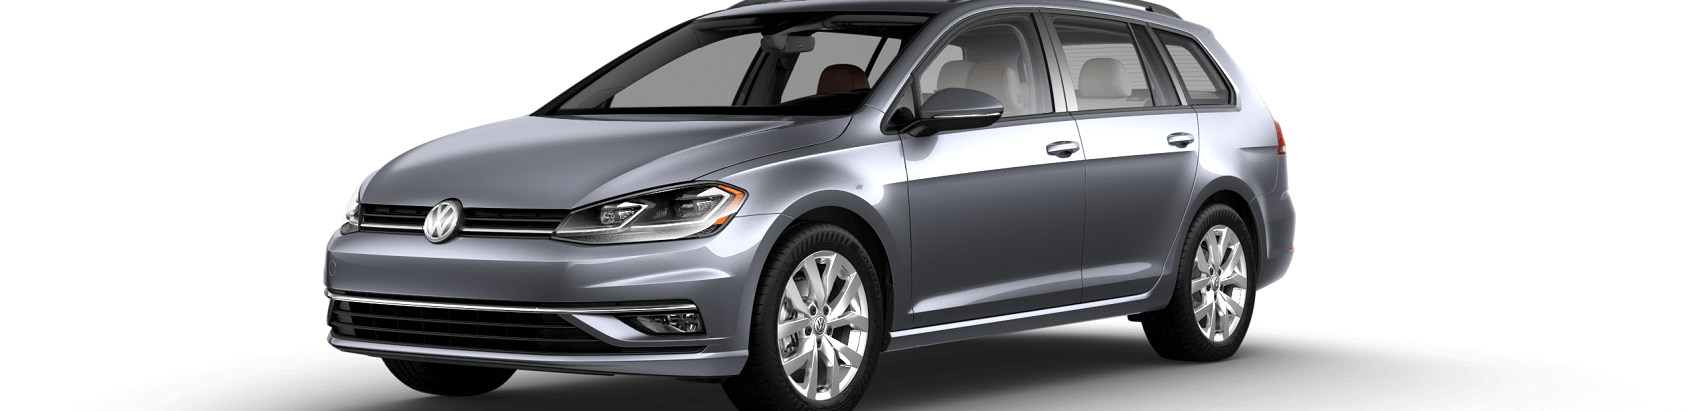 Volkswagen Golf Sportwagen Platinum Gray